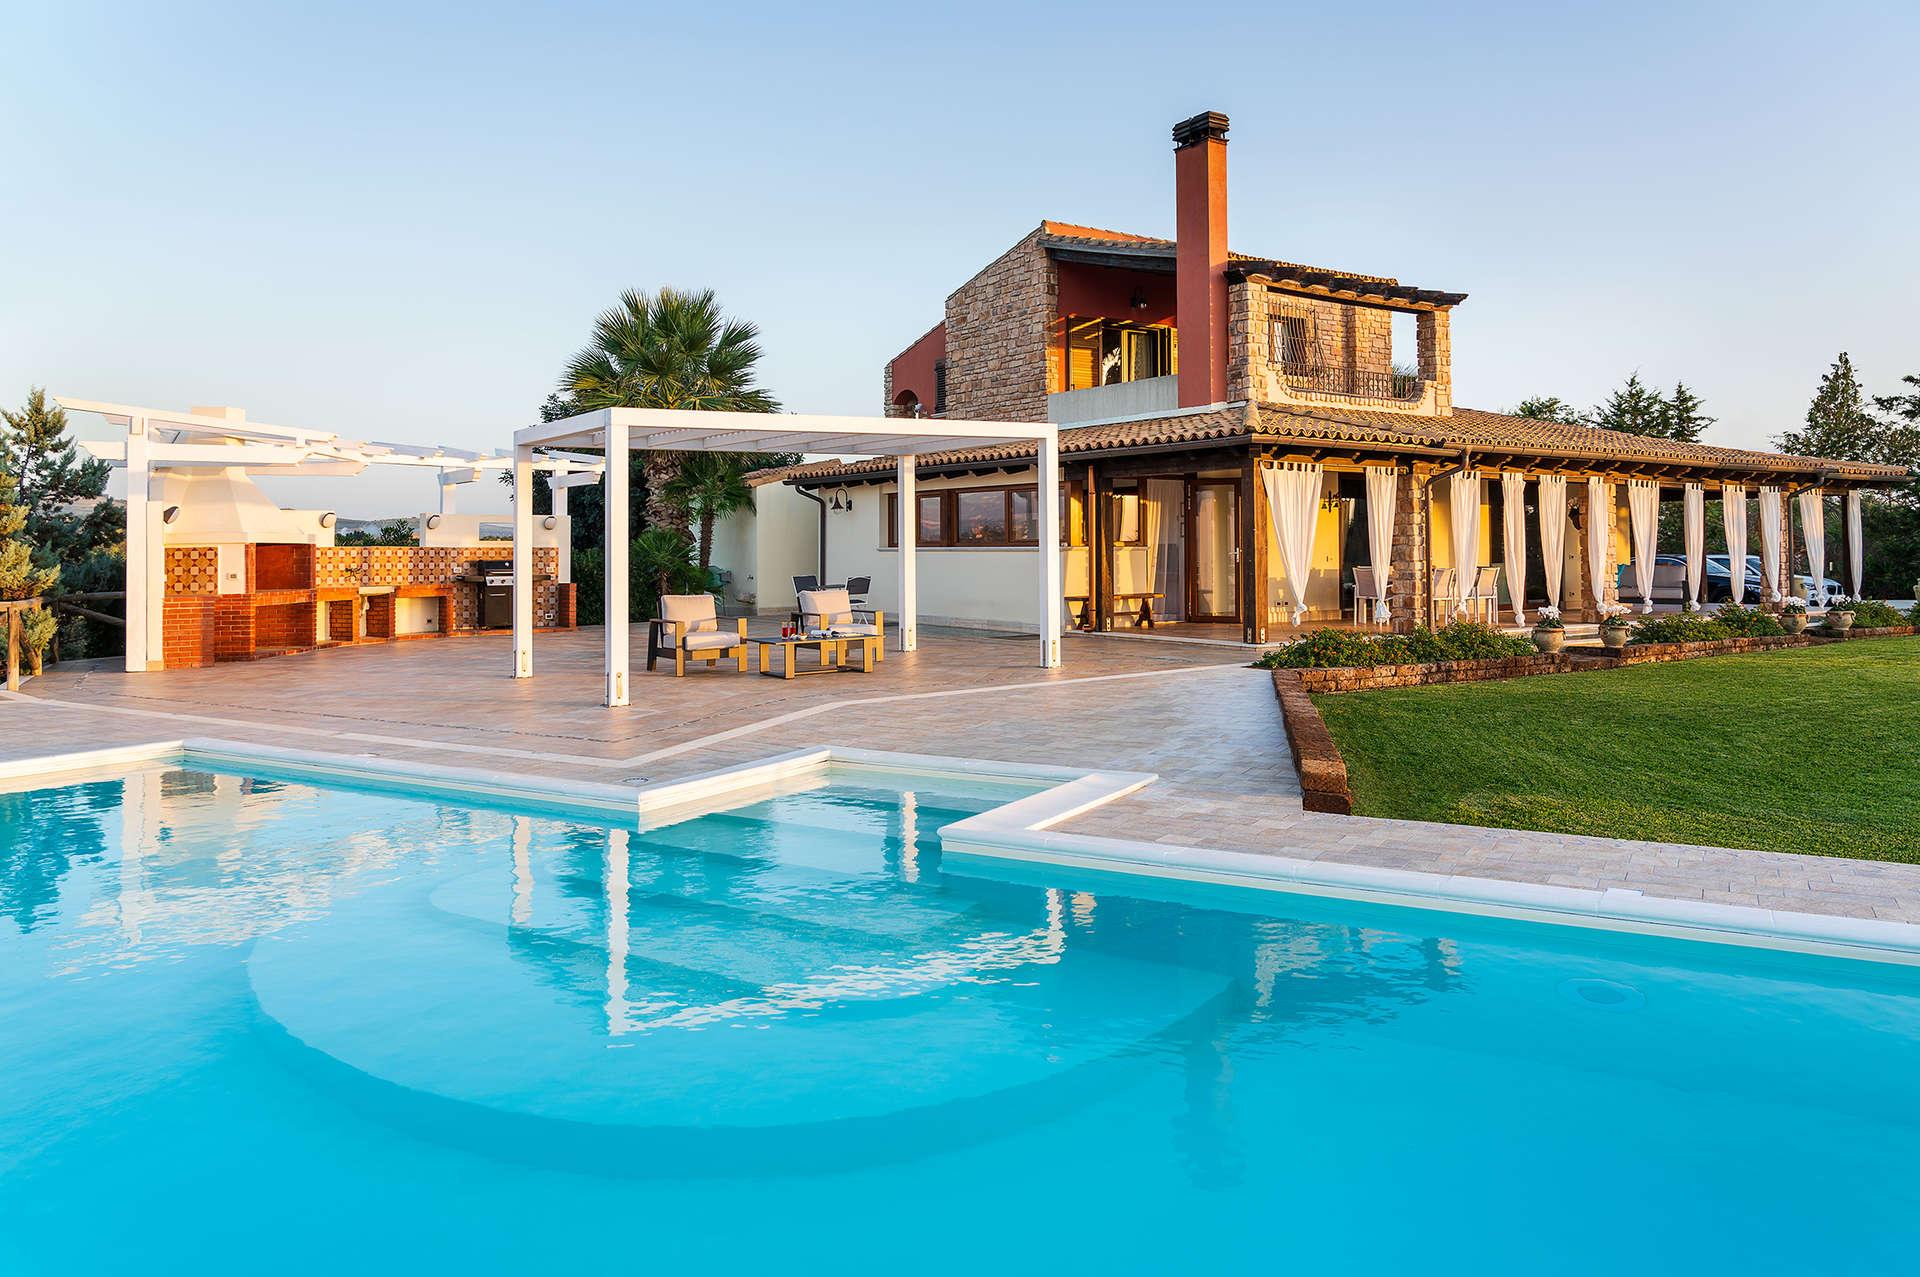 Luxury vacation rentals europe - Italy - Sicily - Trapani - Villa Cielo - Image 1/49